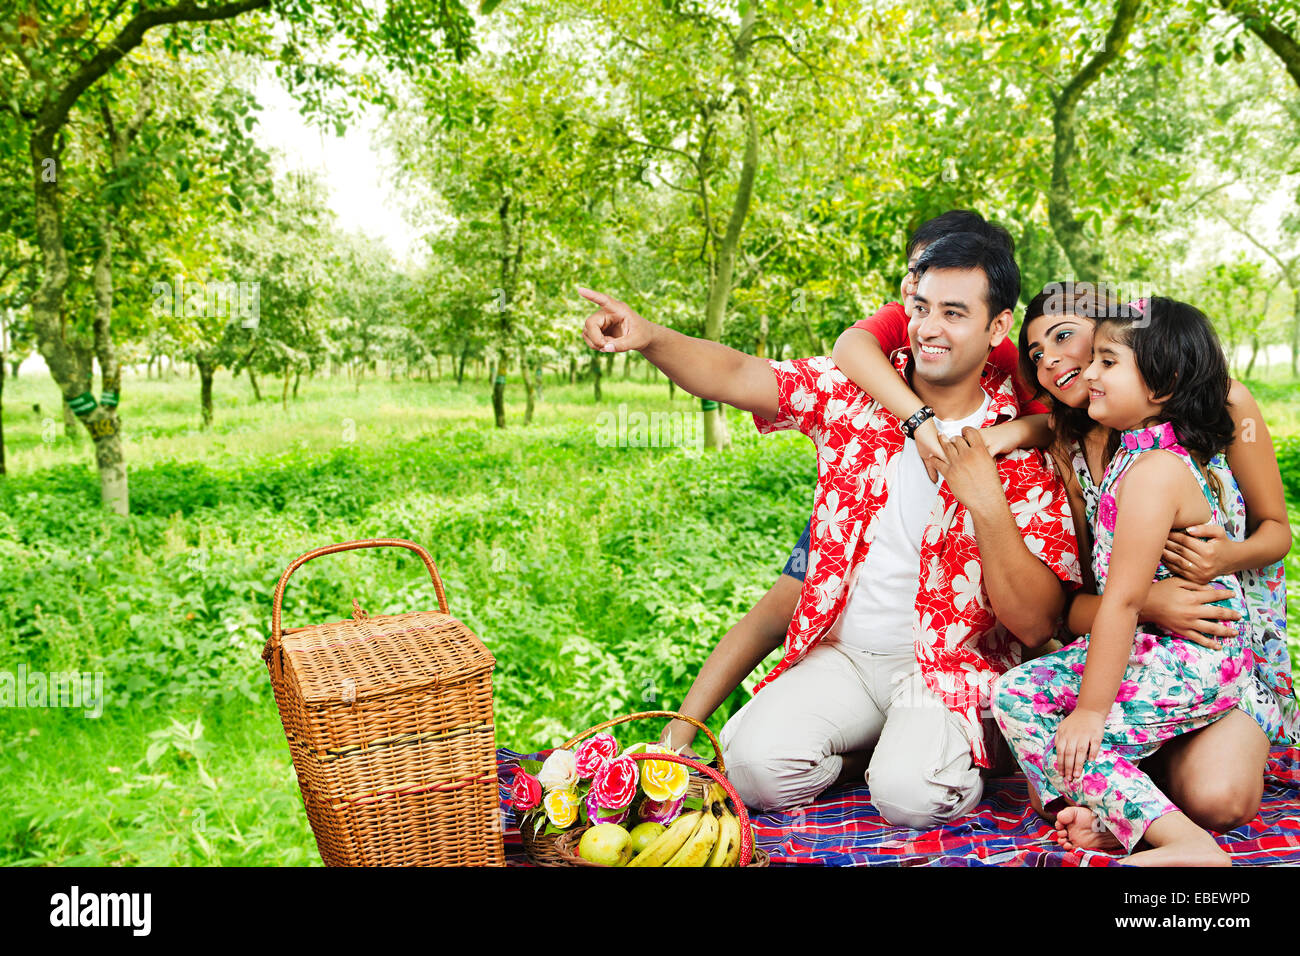 Indian Family Beach Enjoy Picnic Stock Photo Royalty Free Image 75930245 Alamy